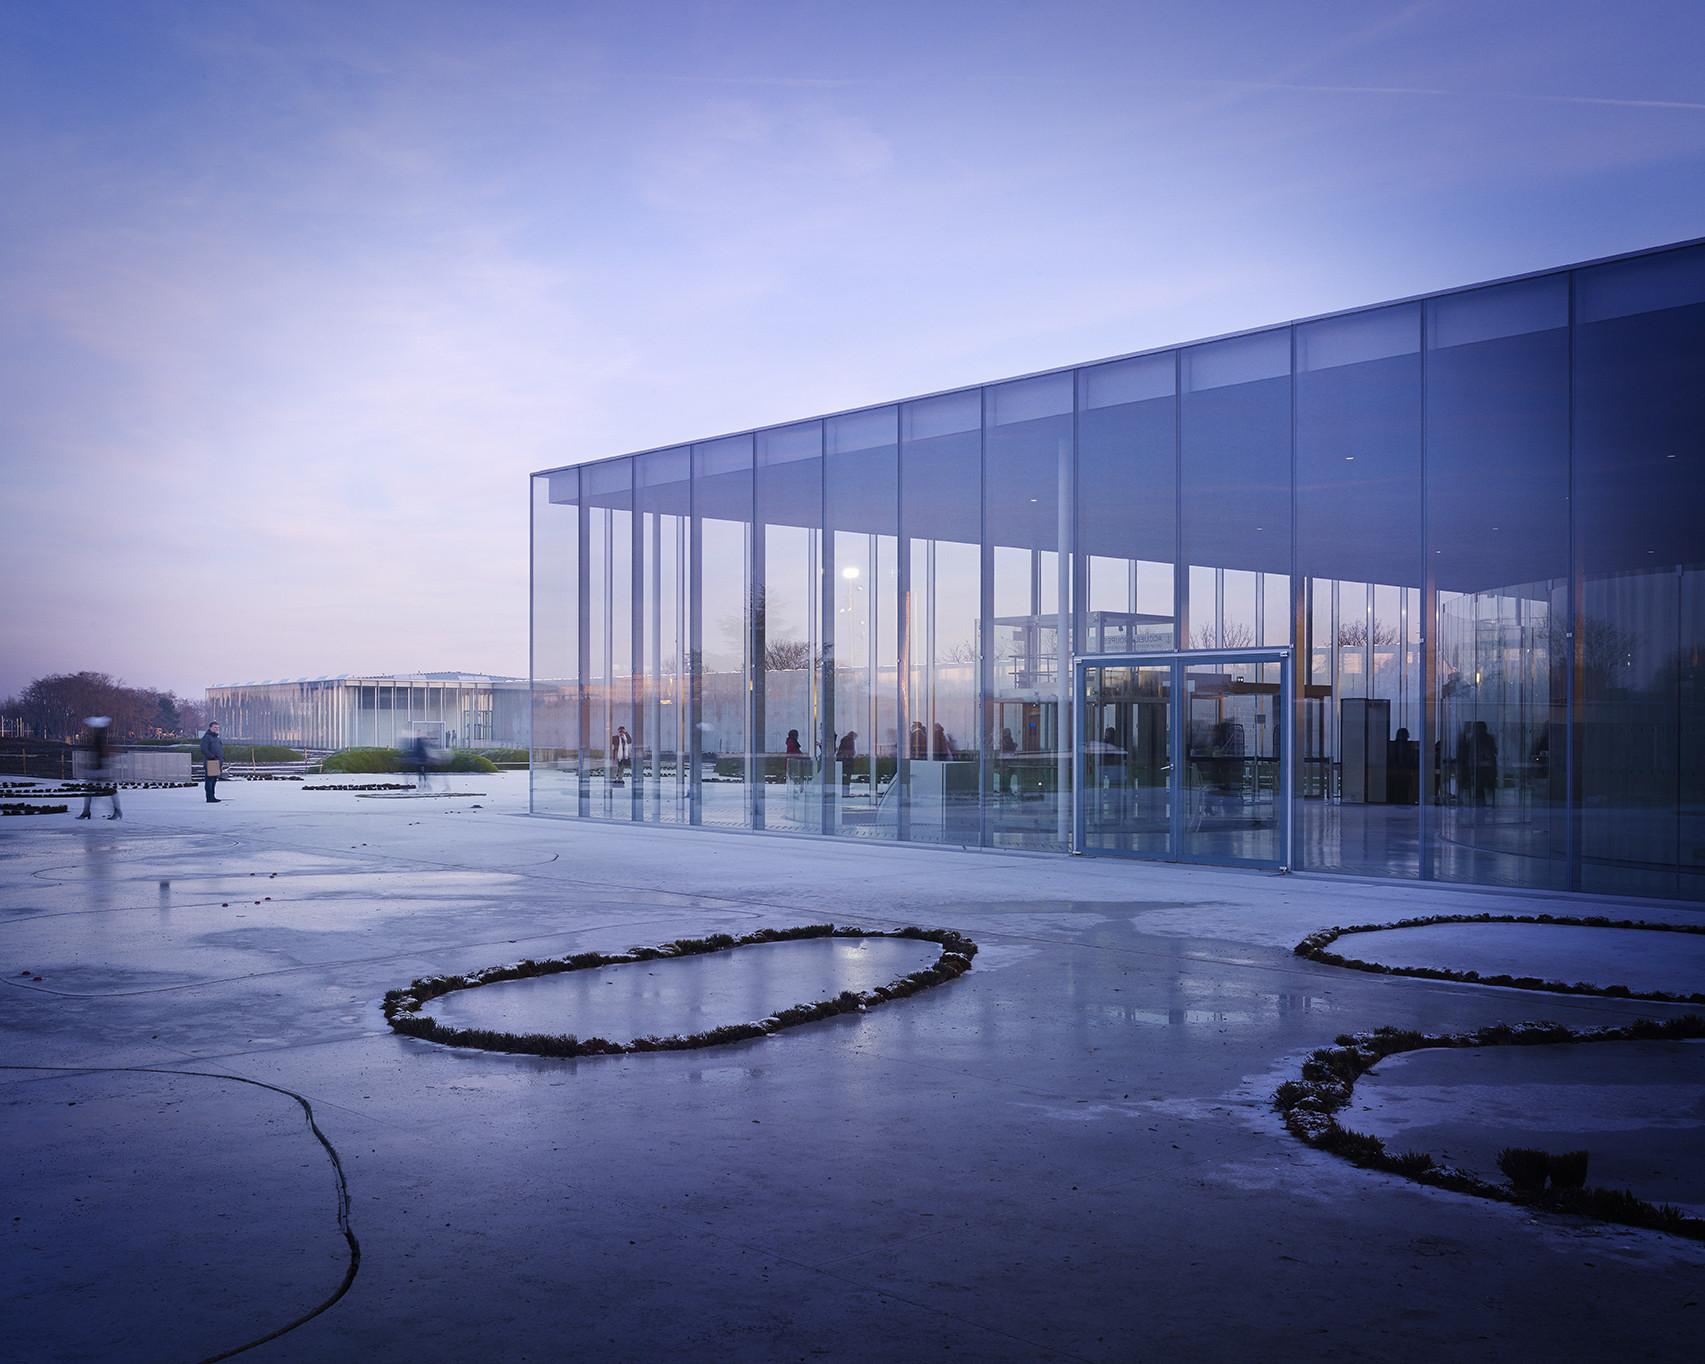 Louvre lens sanaa plataforma arquitectura for Louvre lens museo